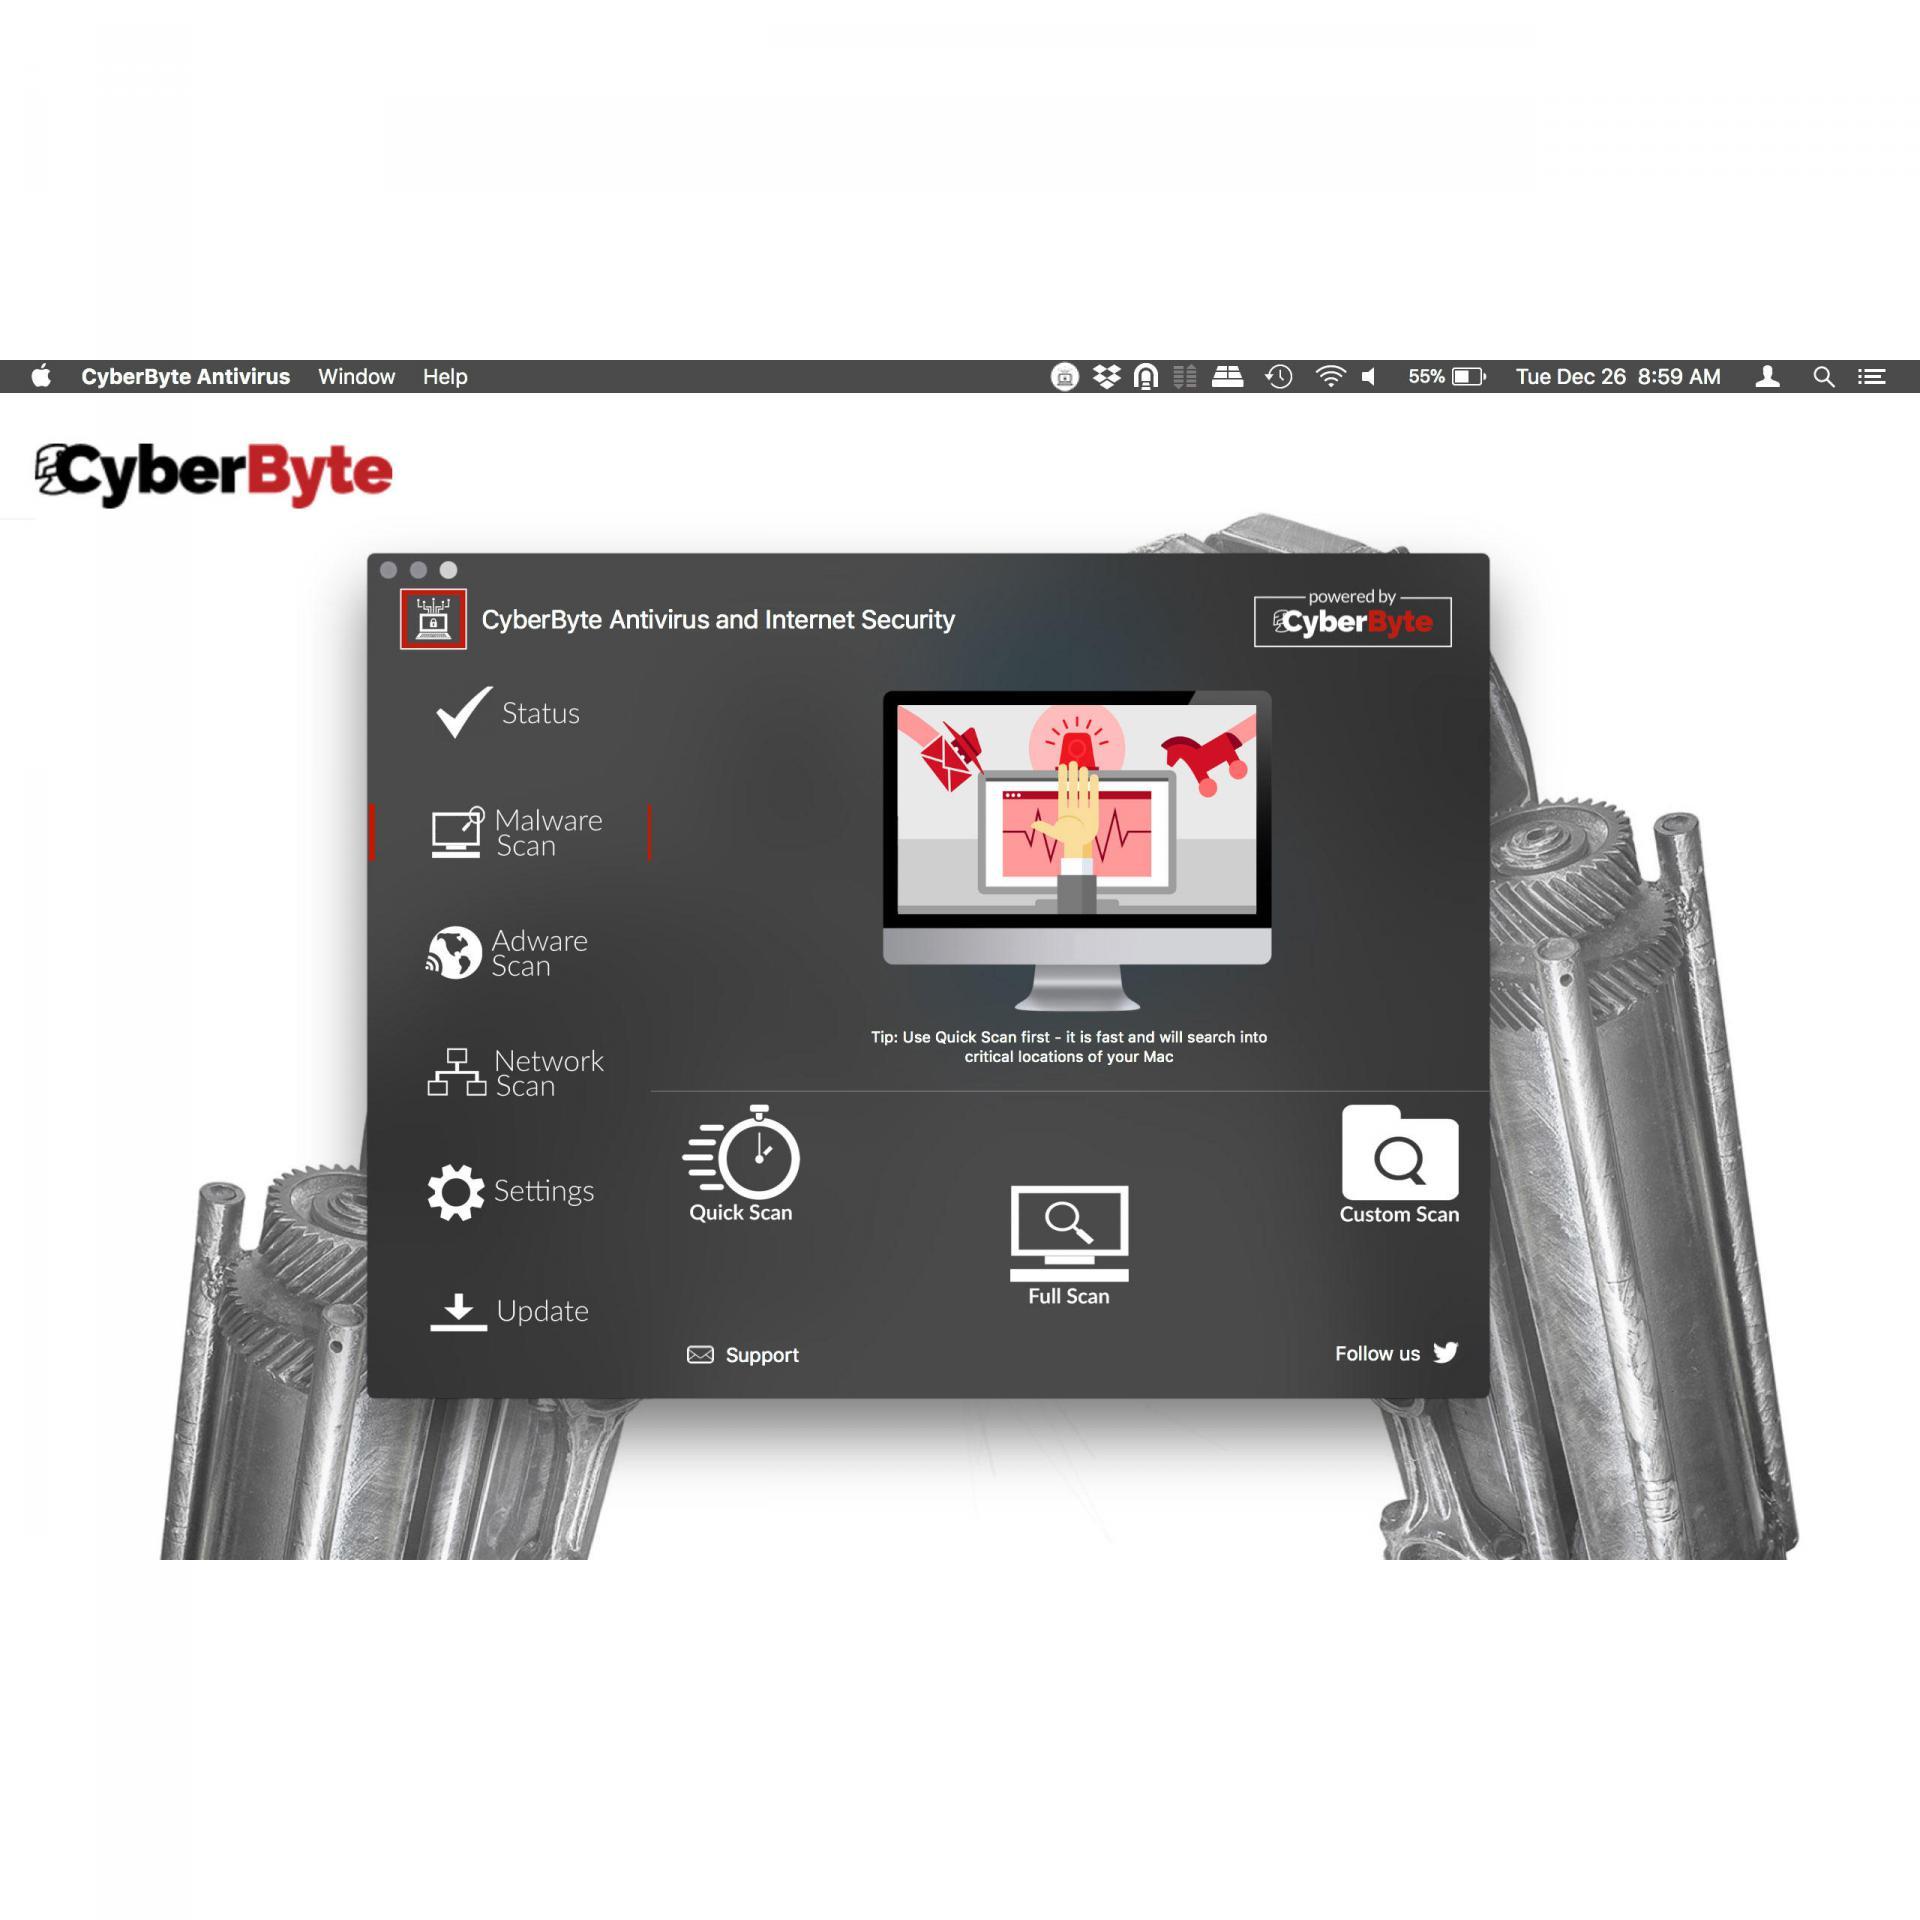 cyberbyte-antivirus_3_329780.jpg